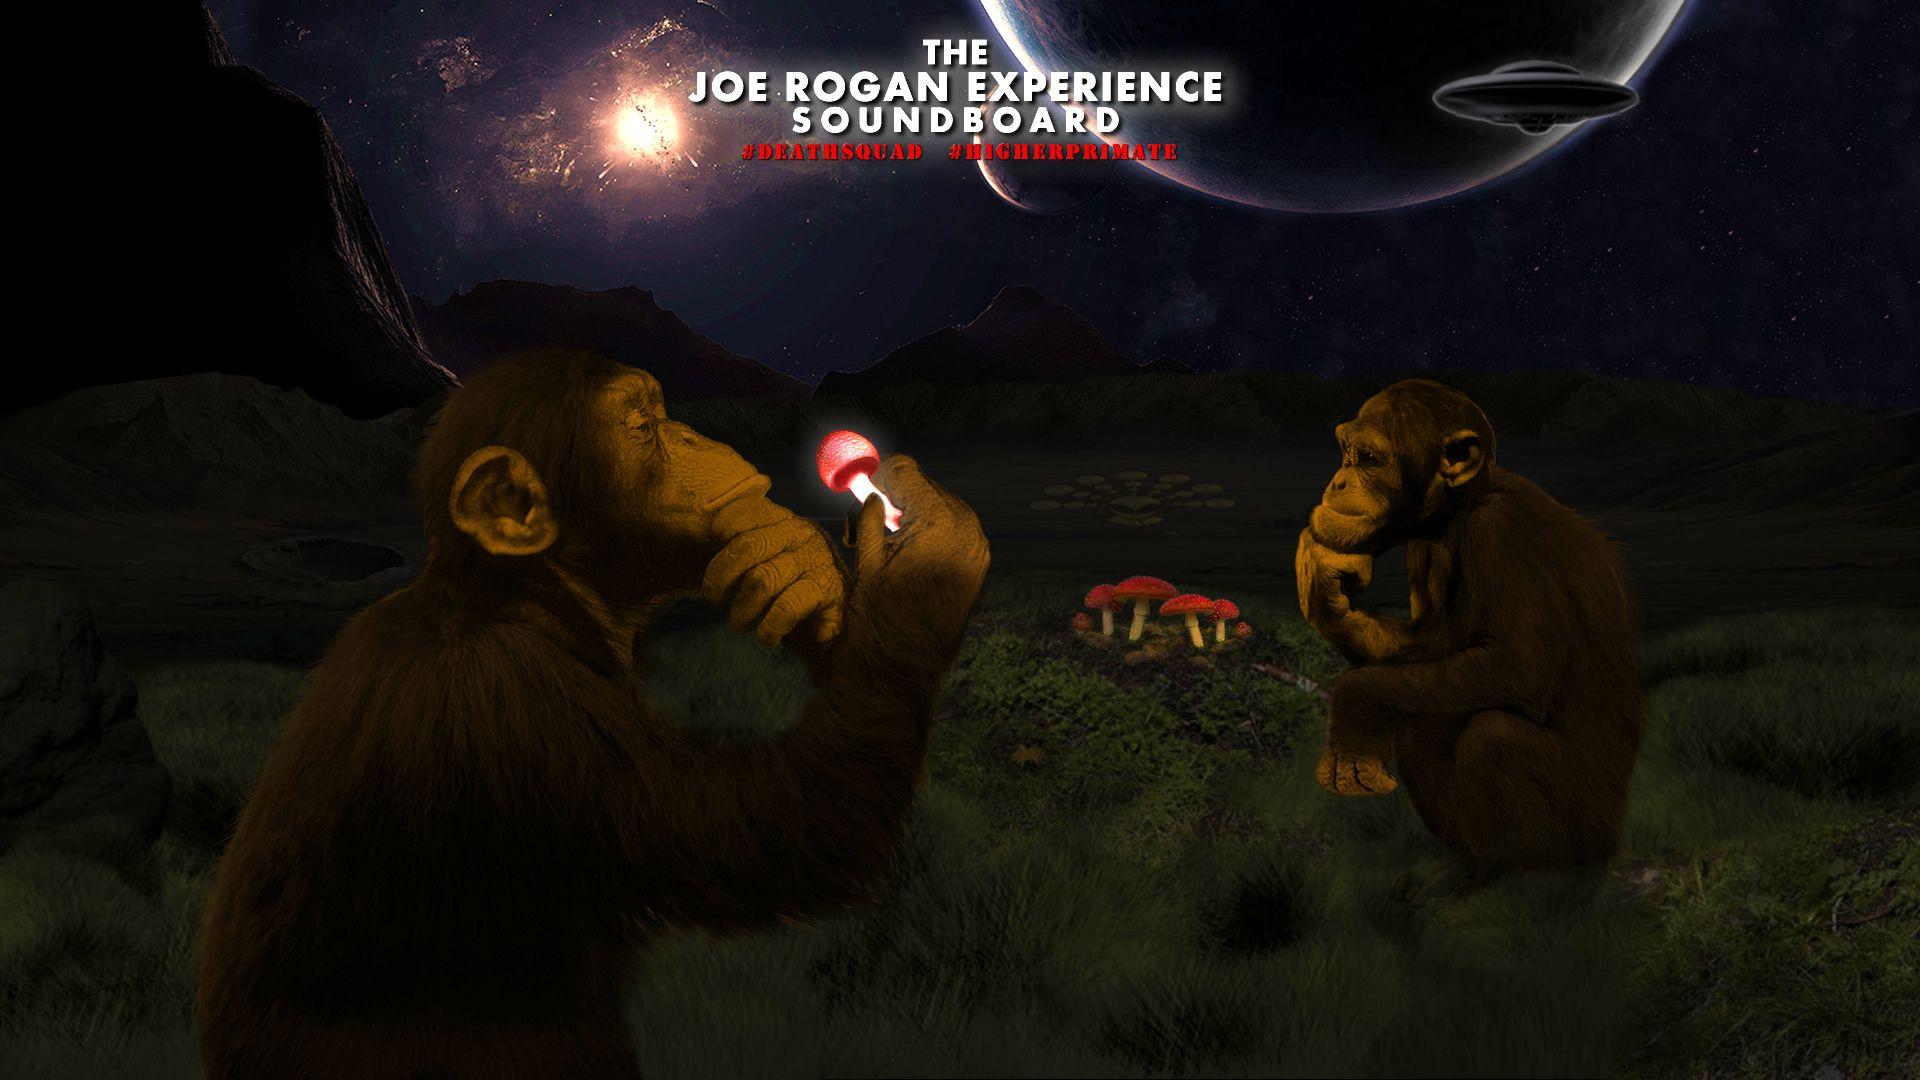 The Joe Rogan Experience Soundboard Wow How Cool Http Www Jresoundboard Com Joe Rogan Experience Joe Rogan The Joe